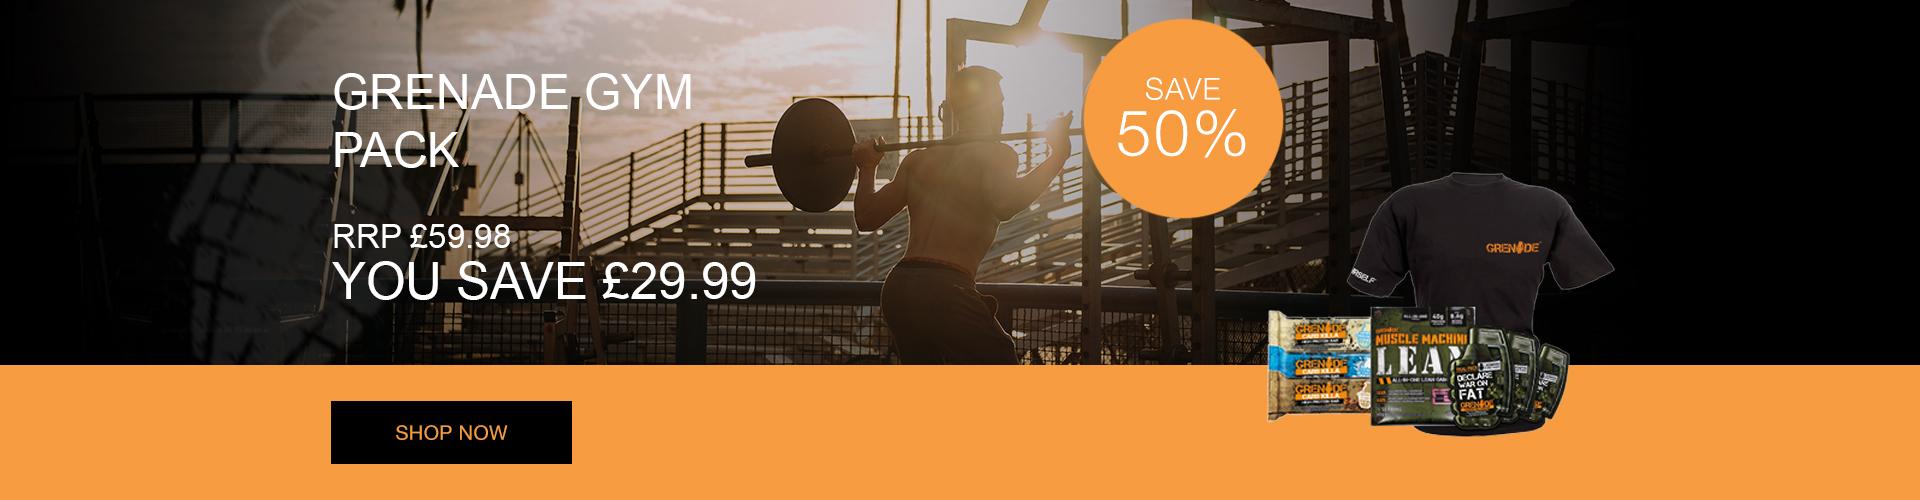 Grenade Gym pack - Save 50%